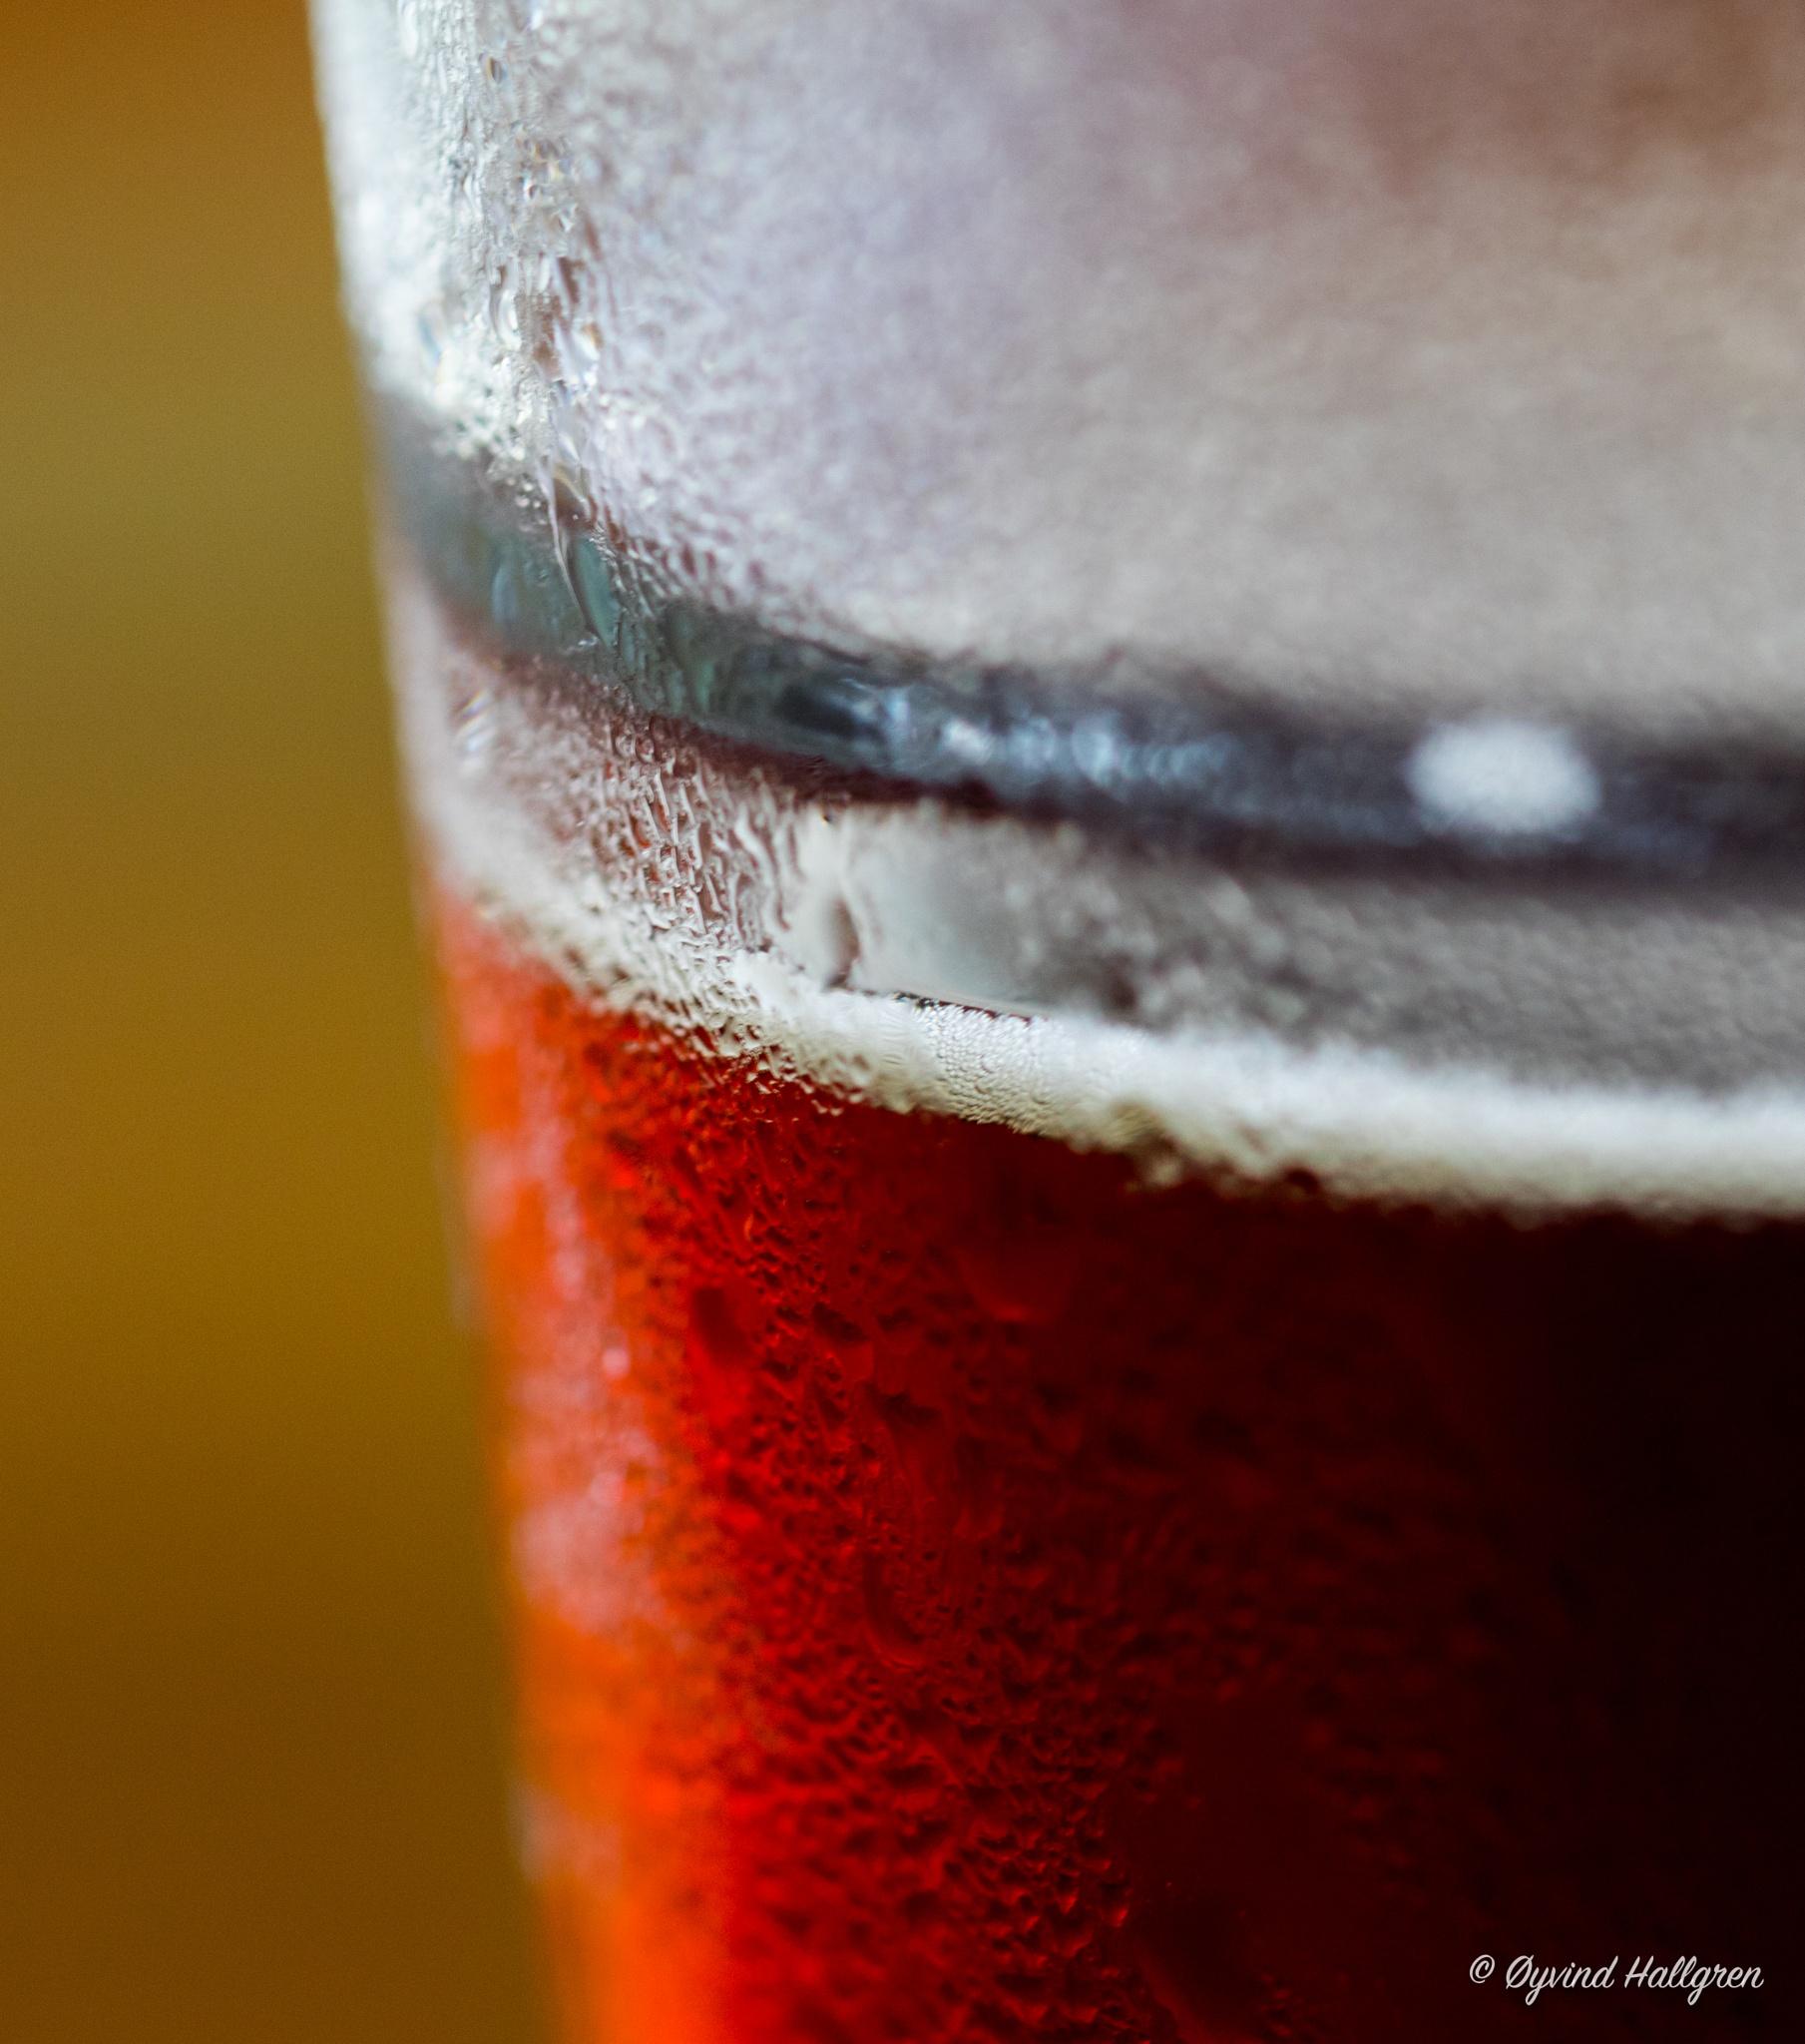 A cold beer is always appreciated  by Hallgren